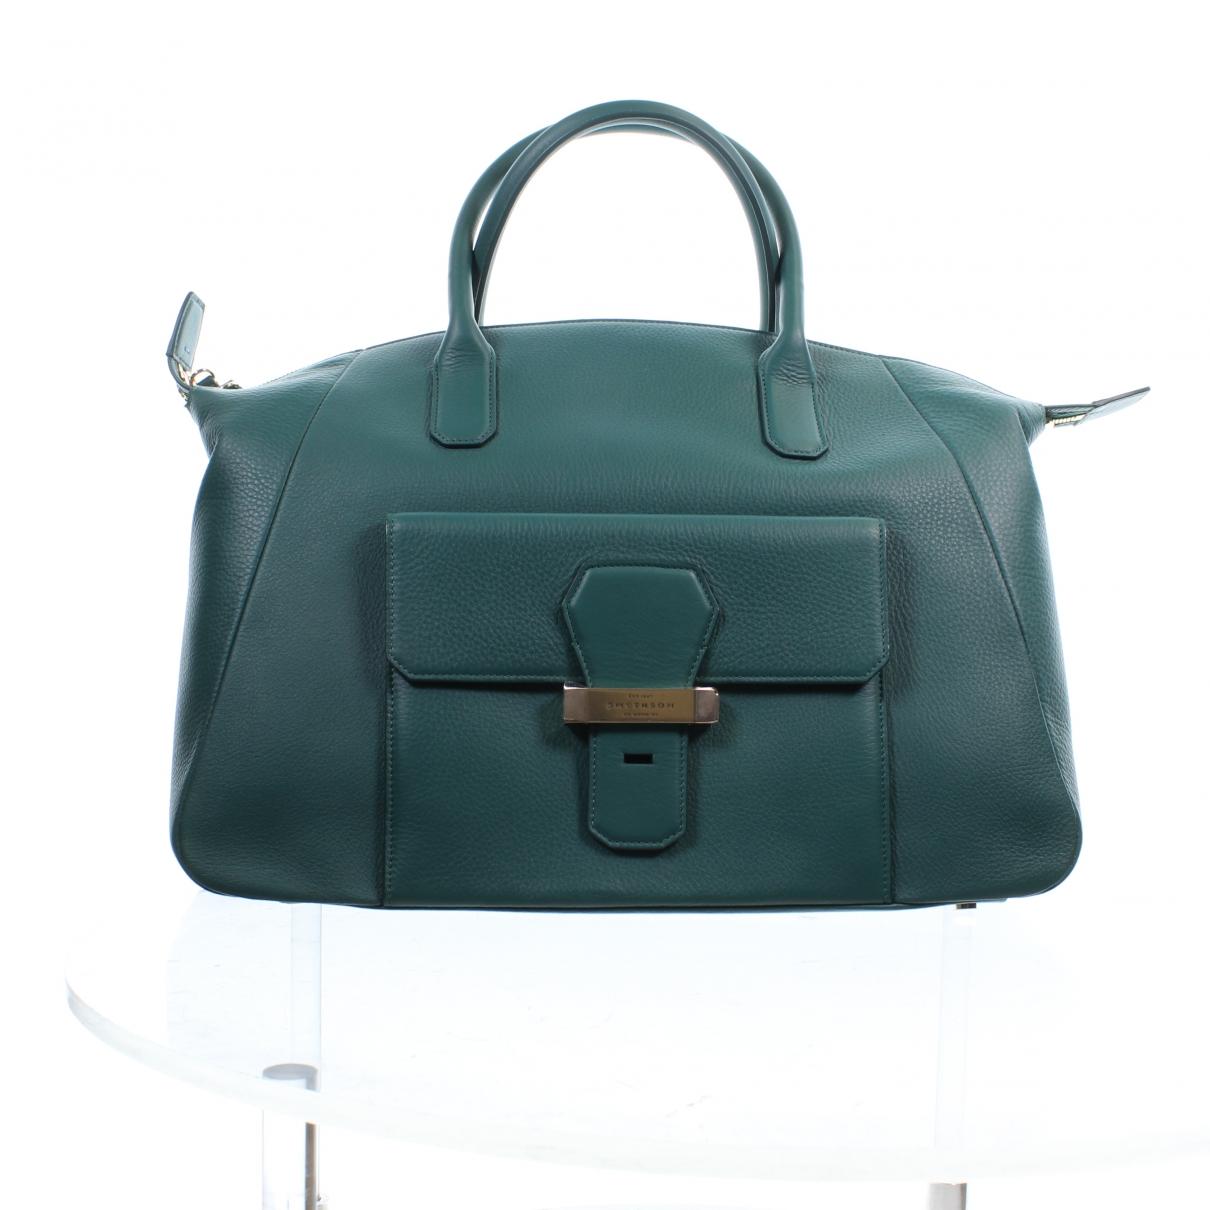 Smythson \N Handtasche in  Gruen Leder